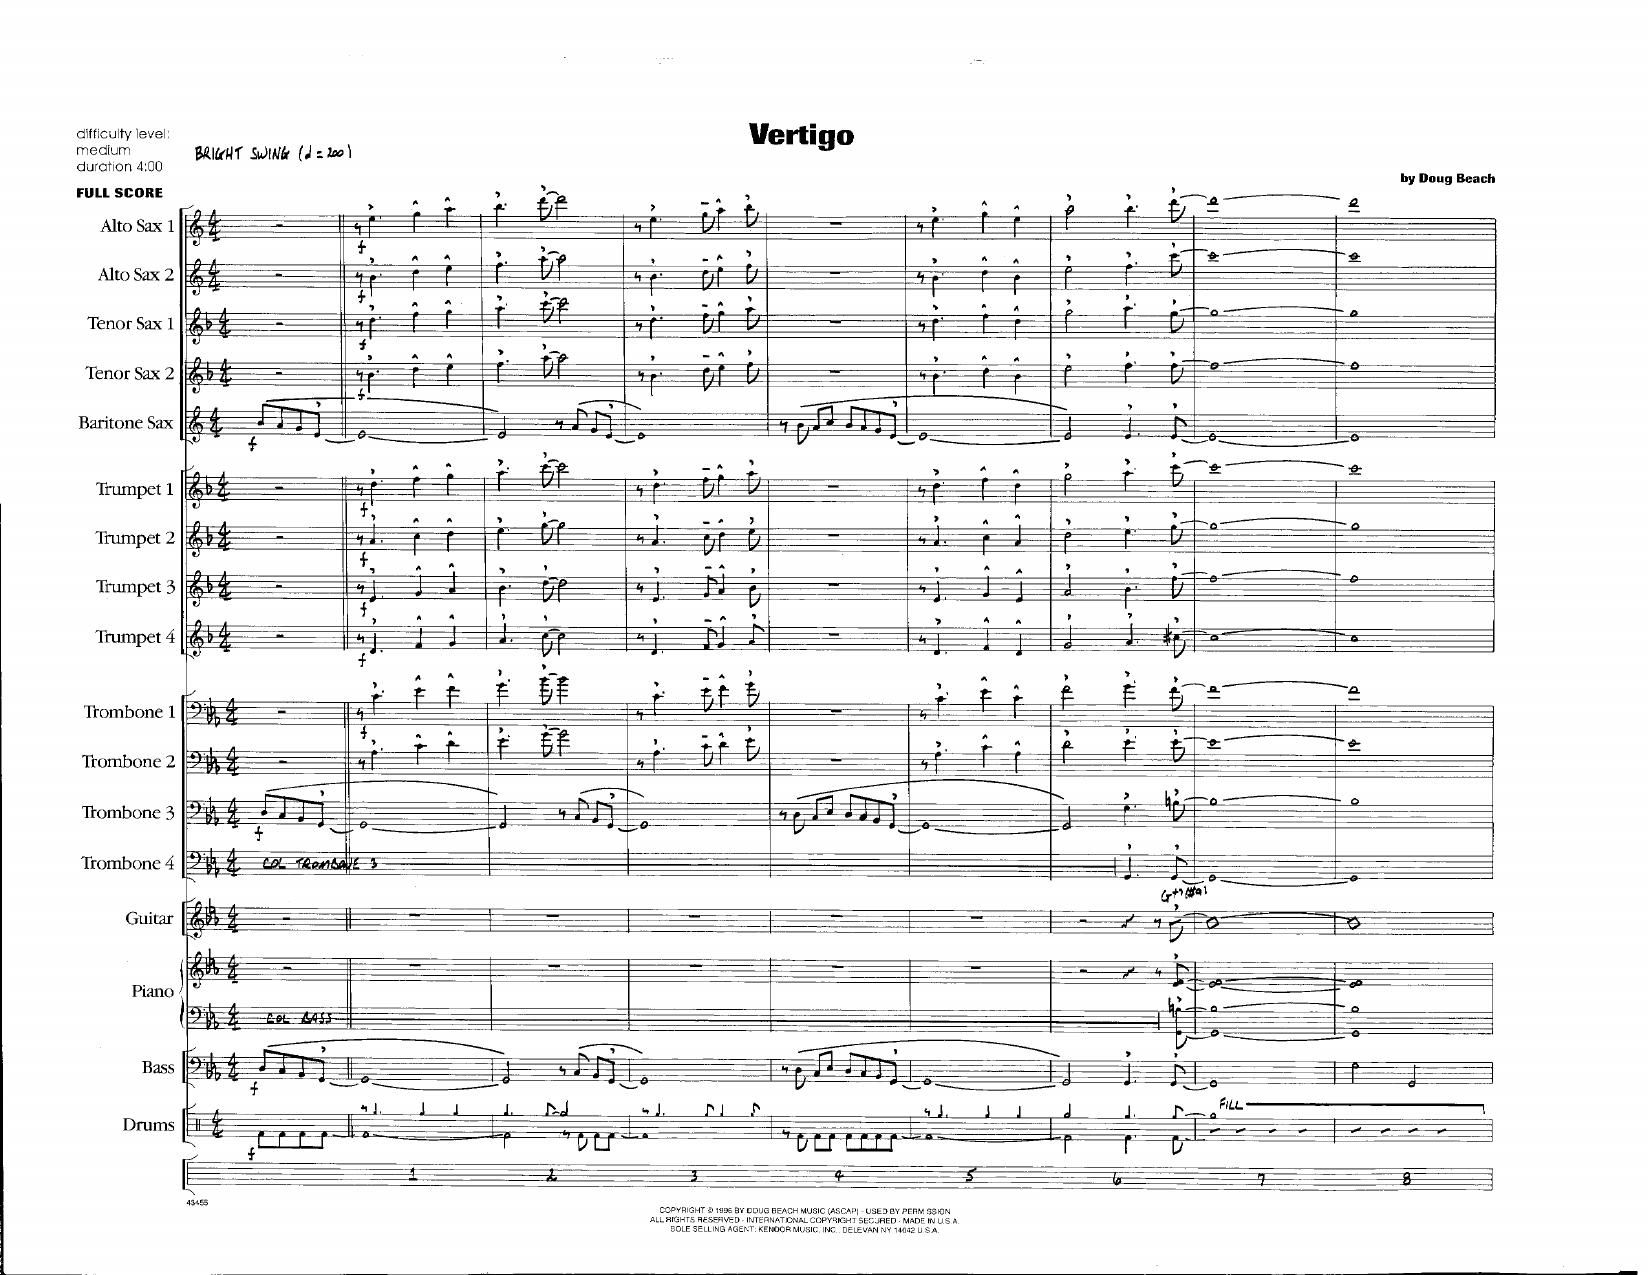 Doug Beach Vertigo - Full Score sheet music notes and chords. Download Printable PDF.